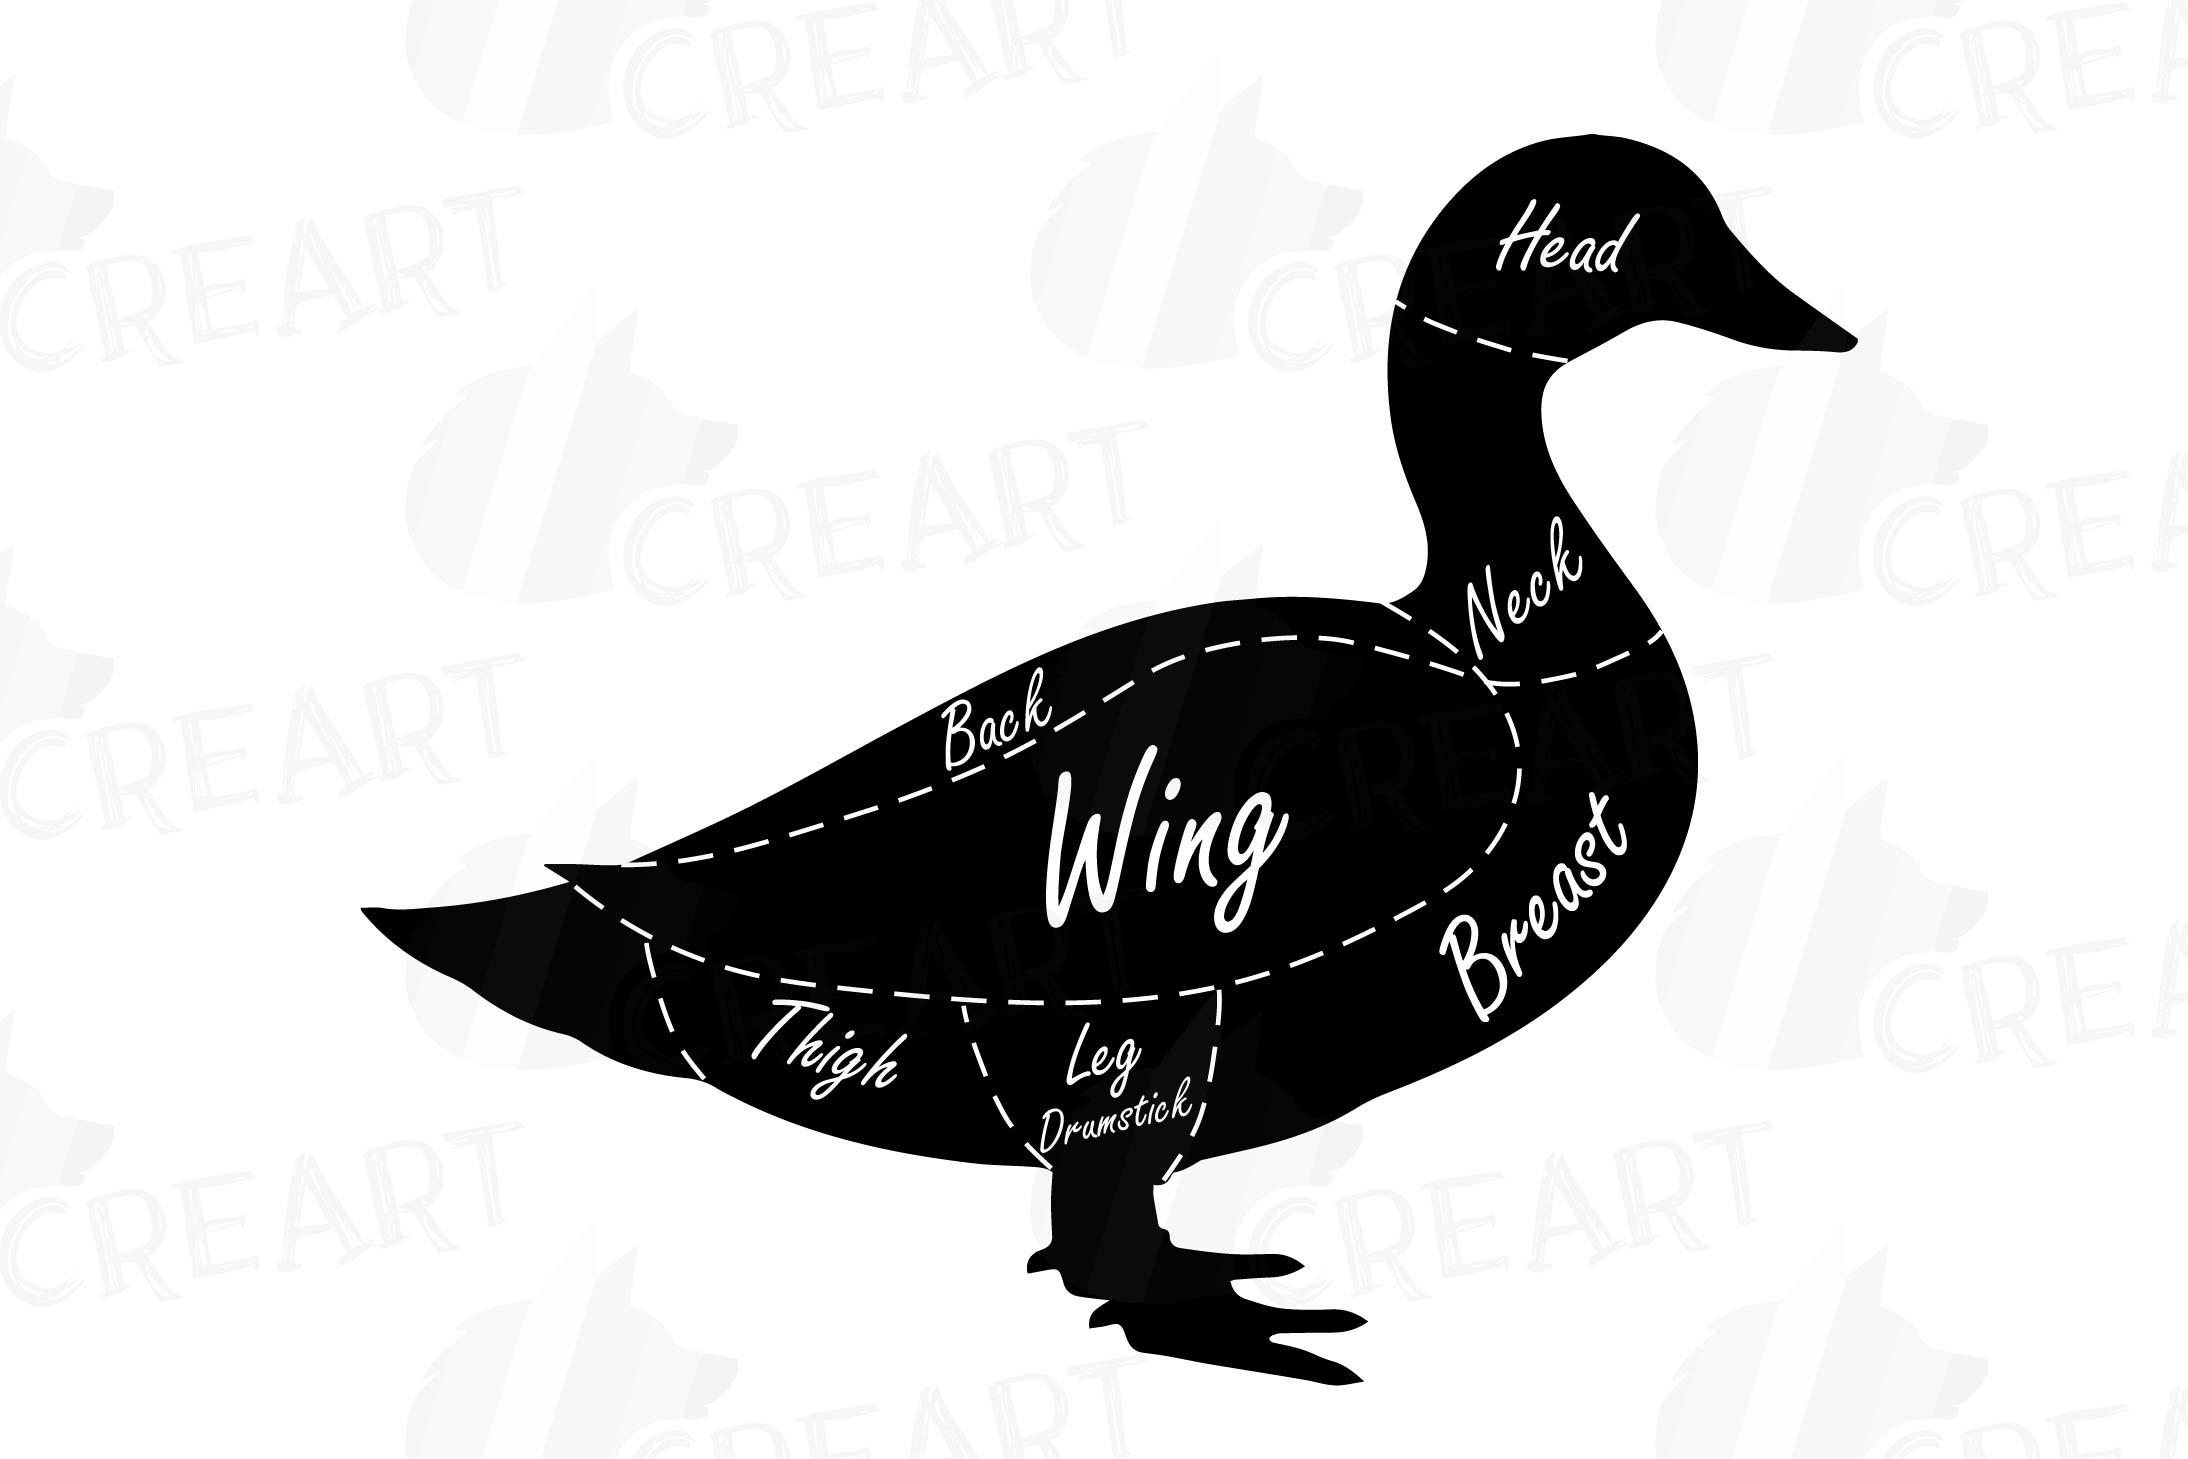 duck wing diagram 7 pin relay butcher clip art digital chart cuts example image 3